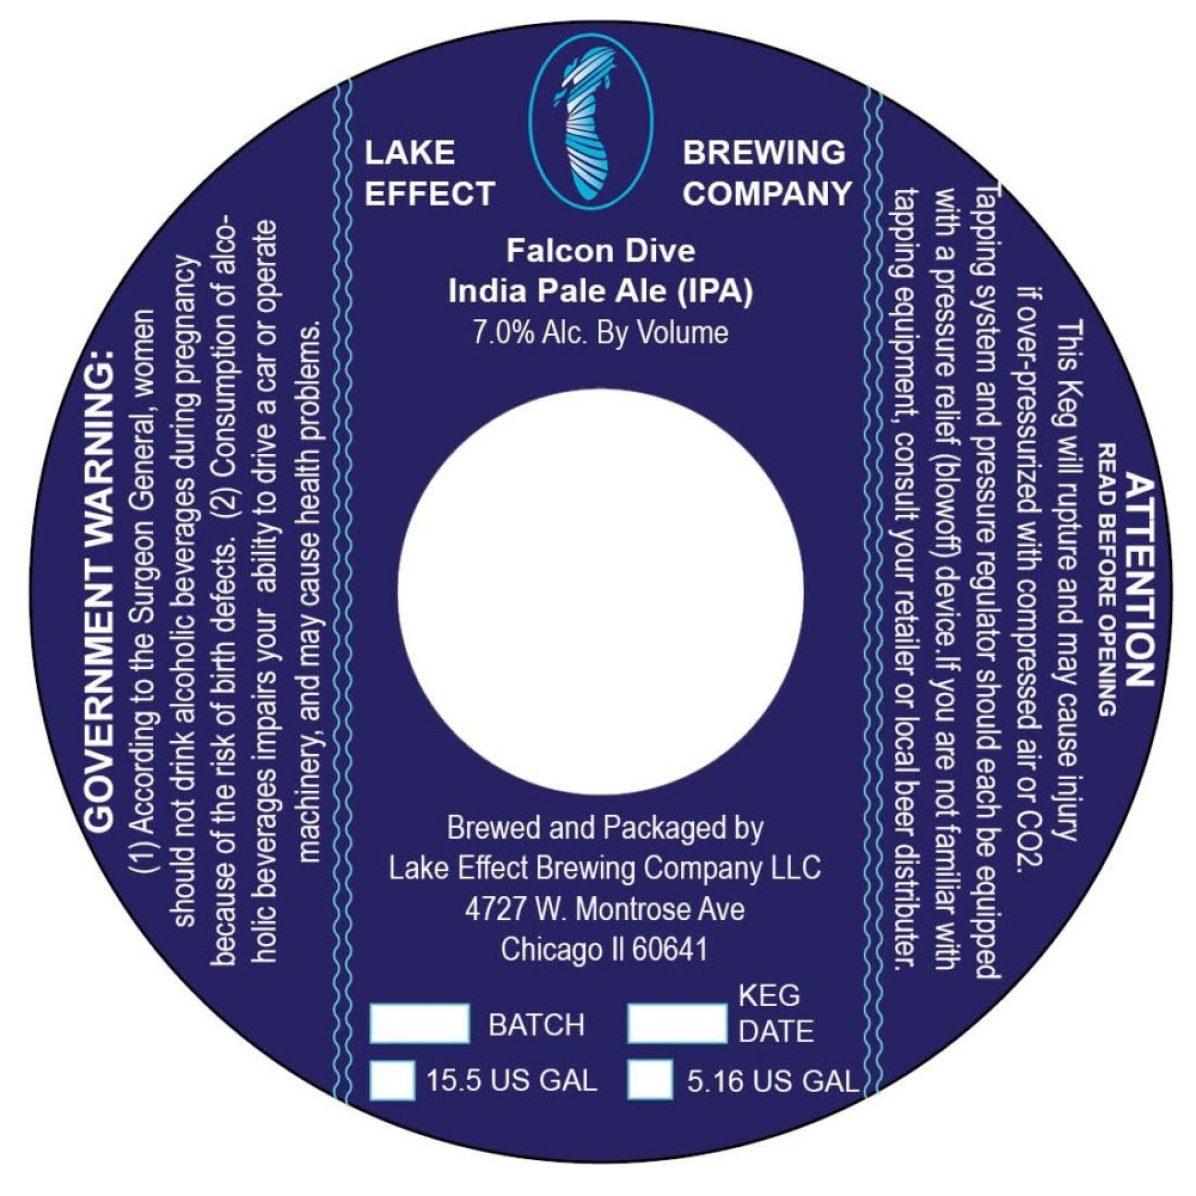 Lake Effect Falcon Dive India Pale Ale